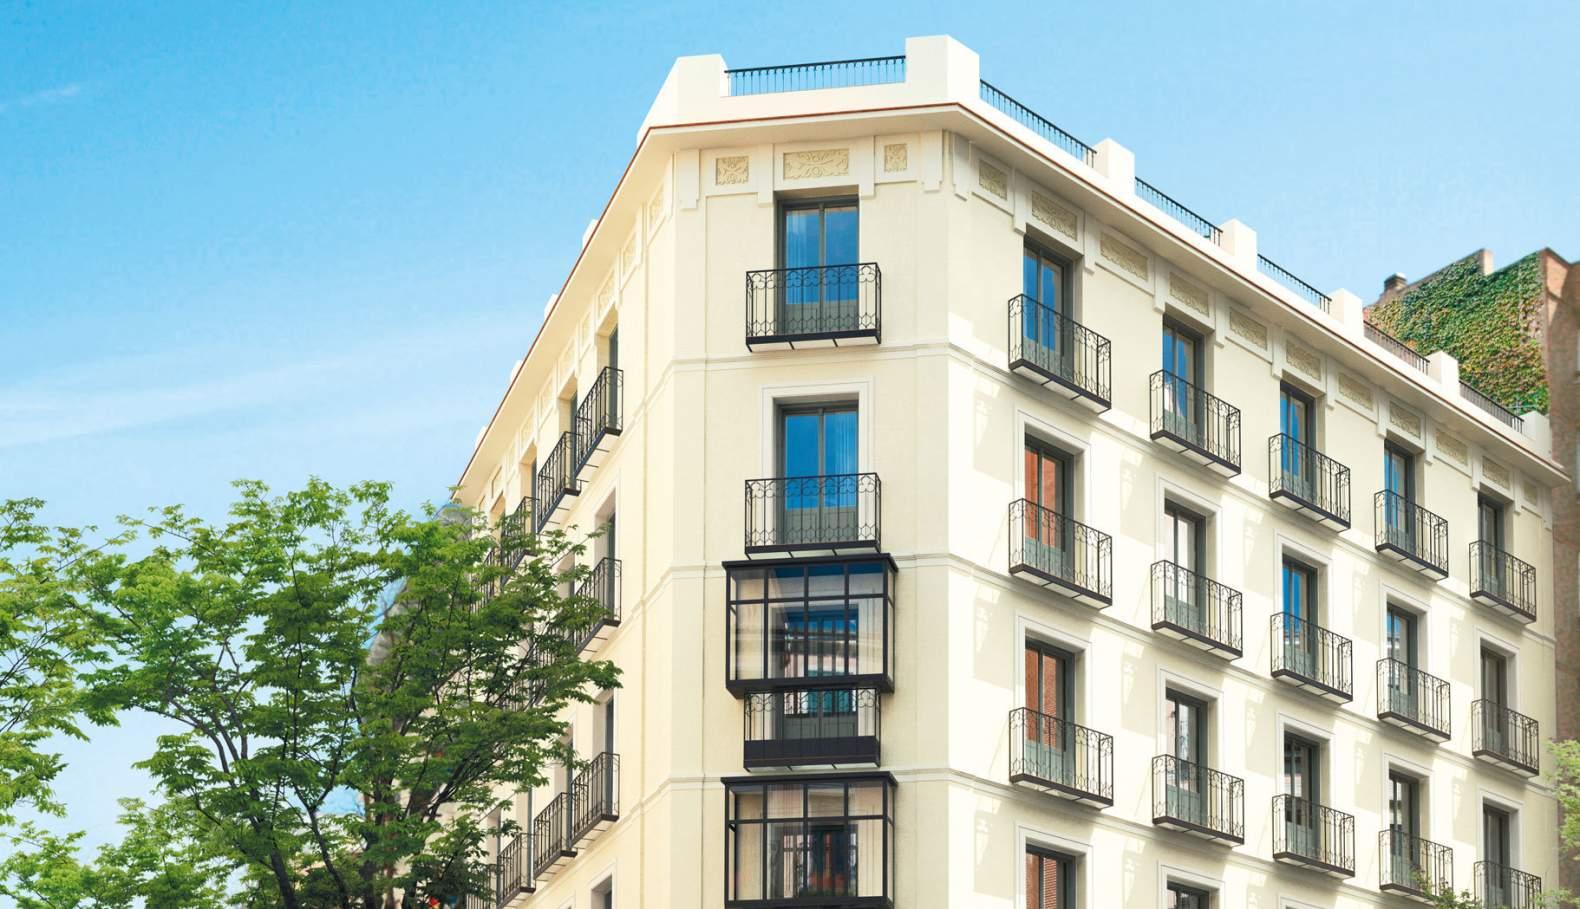 Madrid  - Estudio 1 Cuarto, 1 Habitacion - picture 1